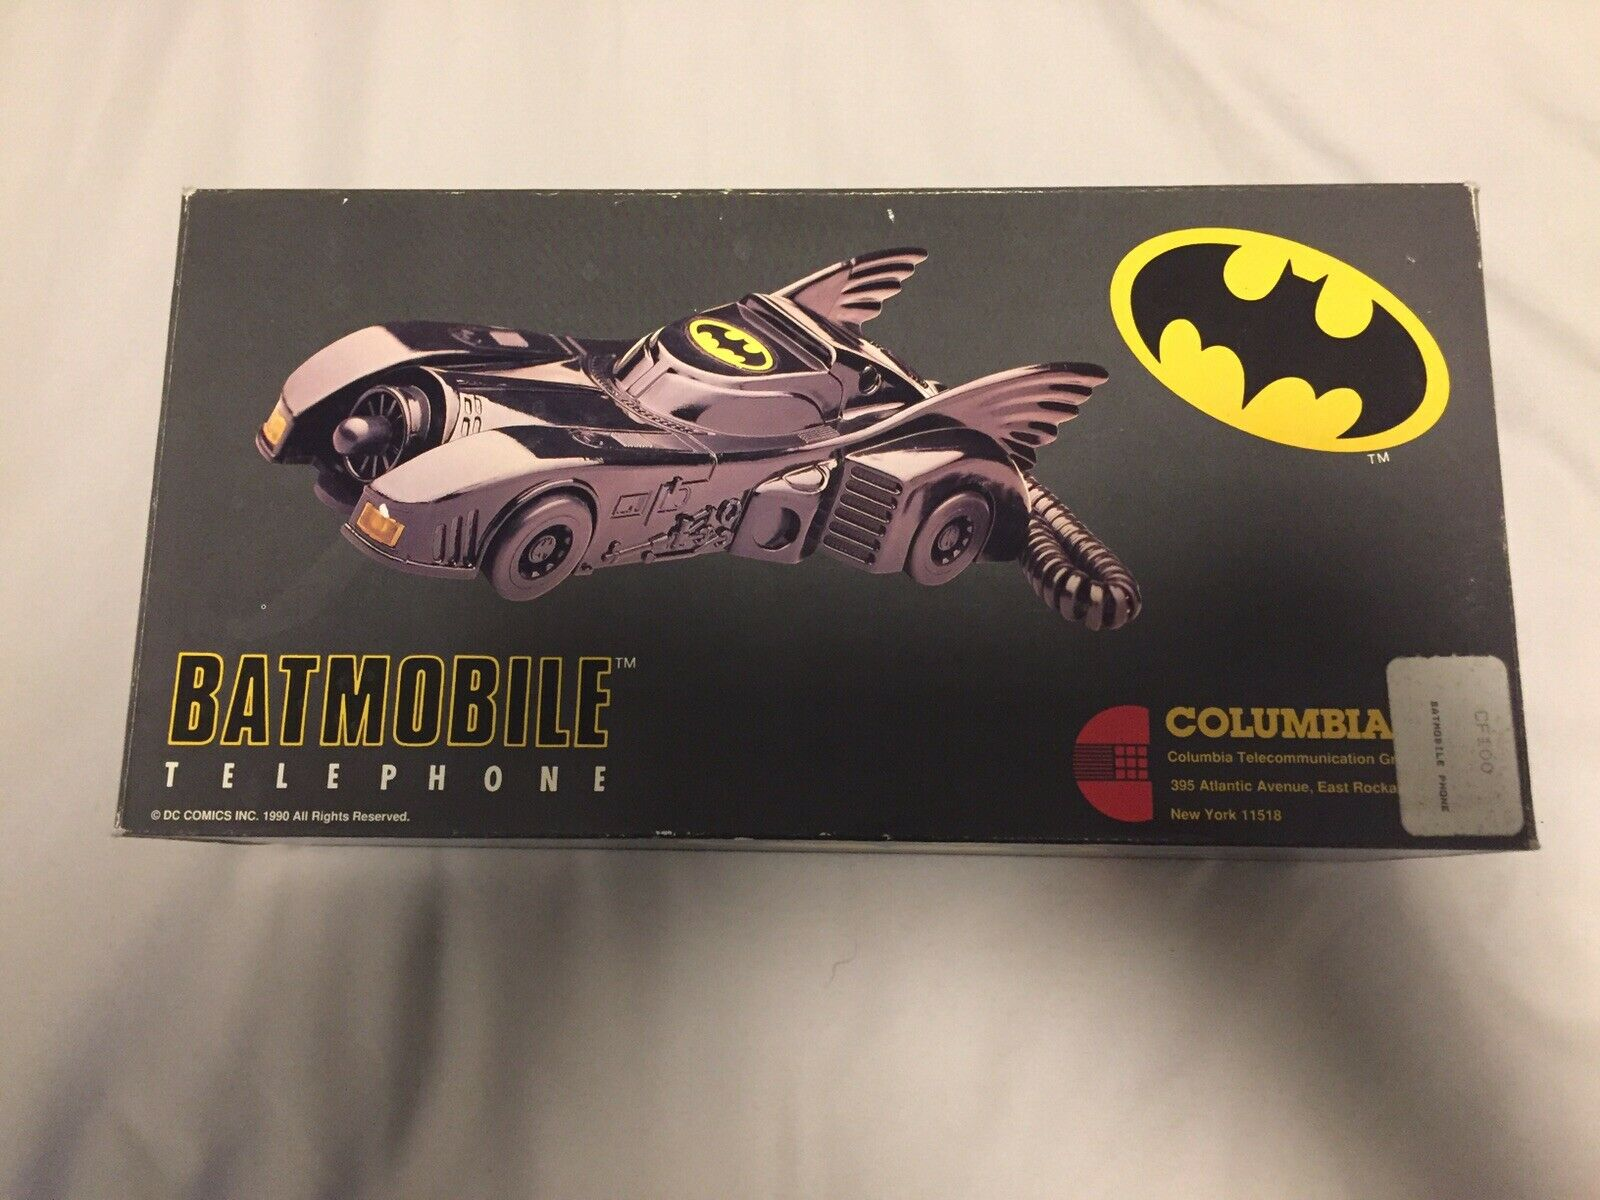 URSPRUNG 1990 BATTMAN BATTMOBILE FILMEN TELEFON I BOX, Working Touch Tone